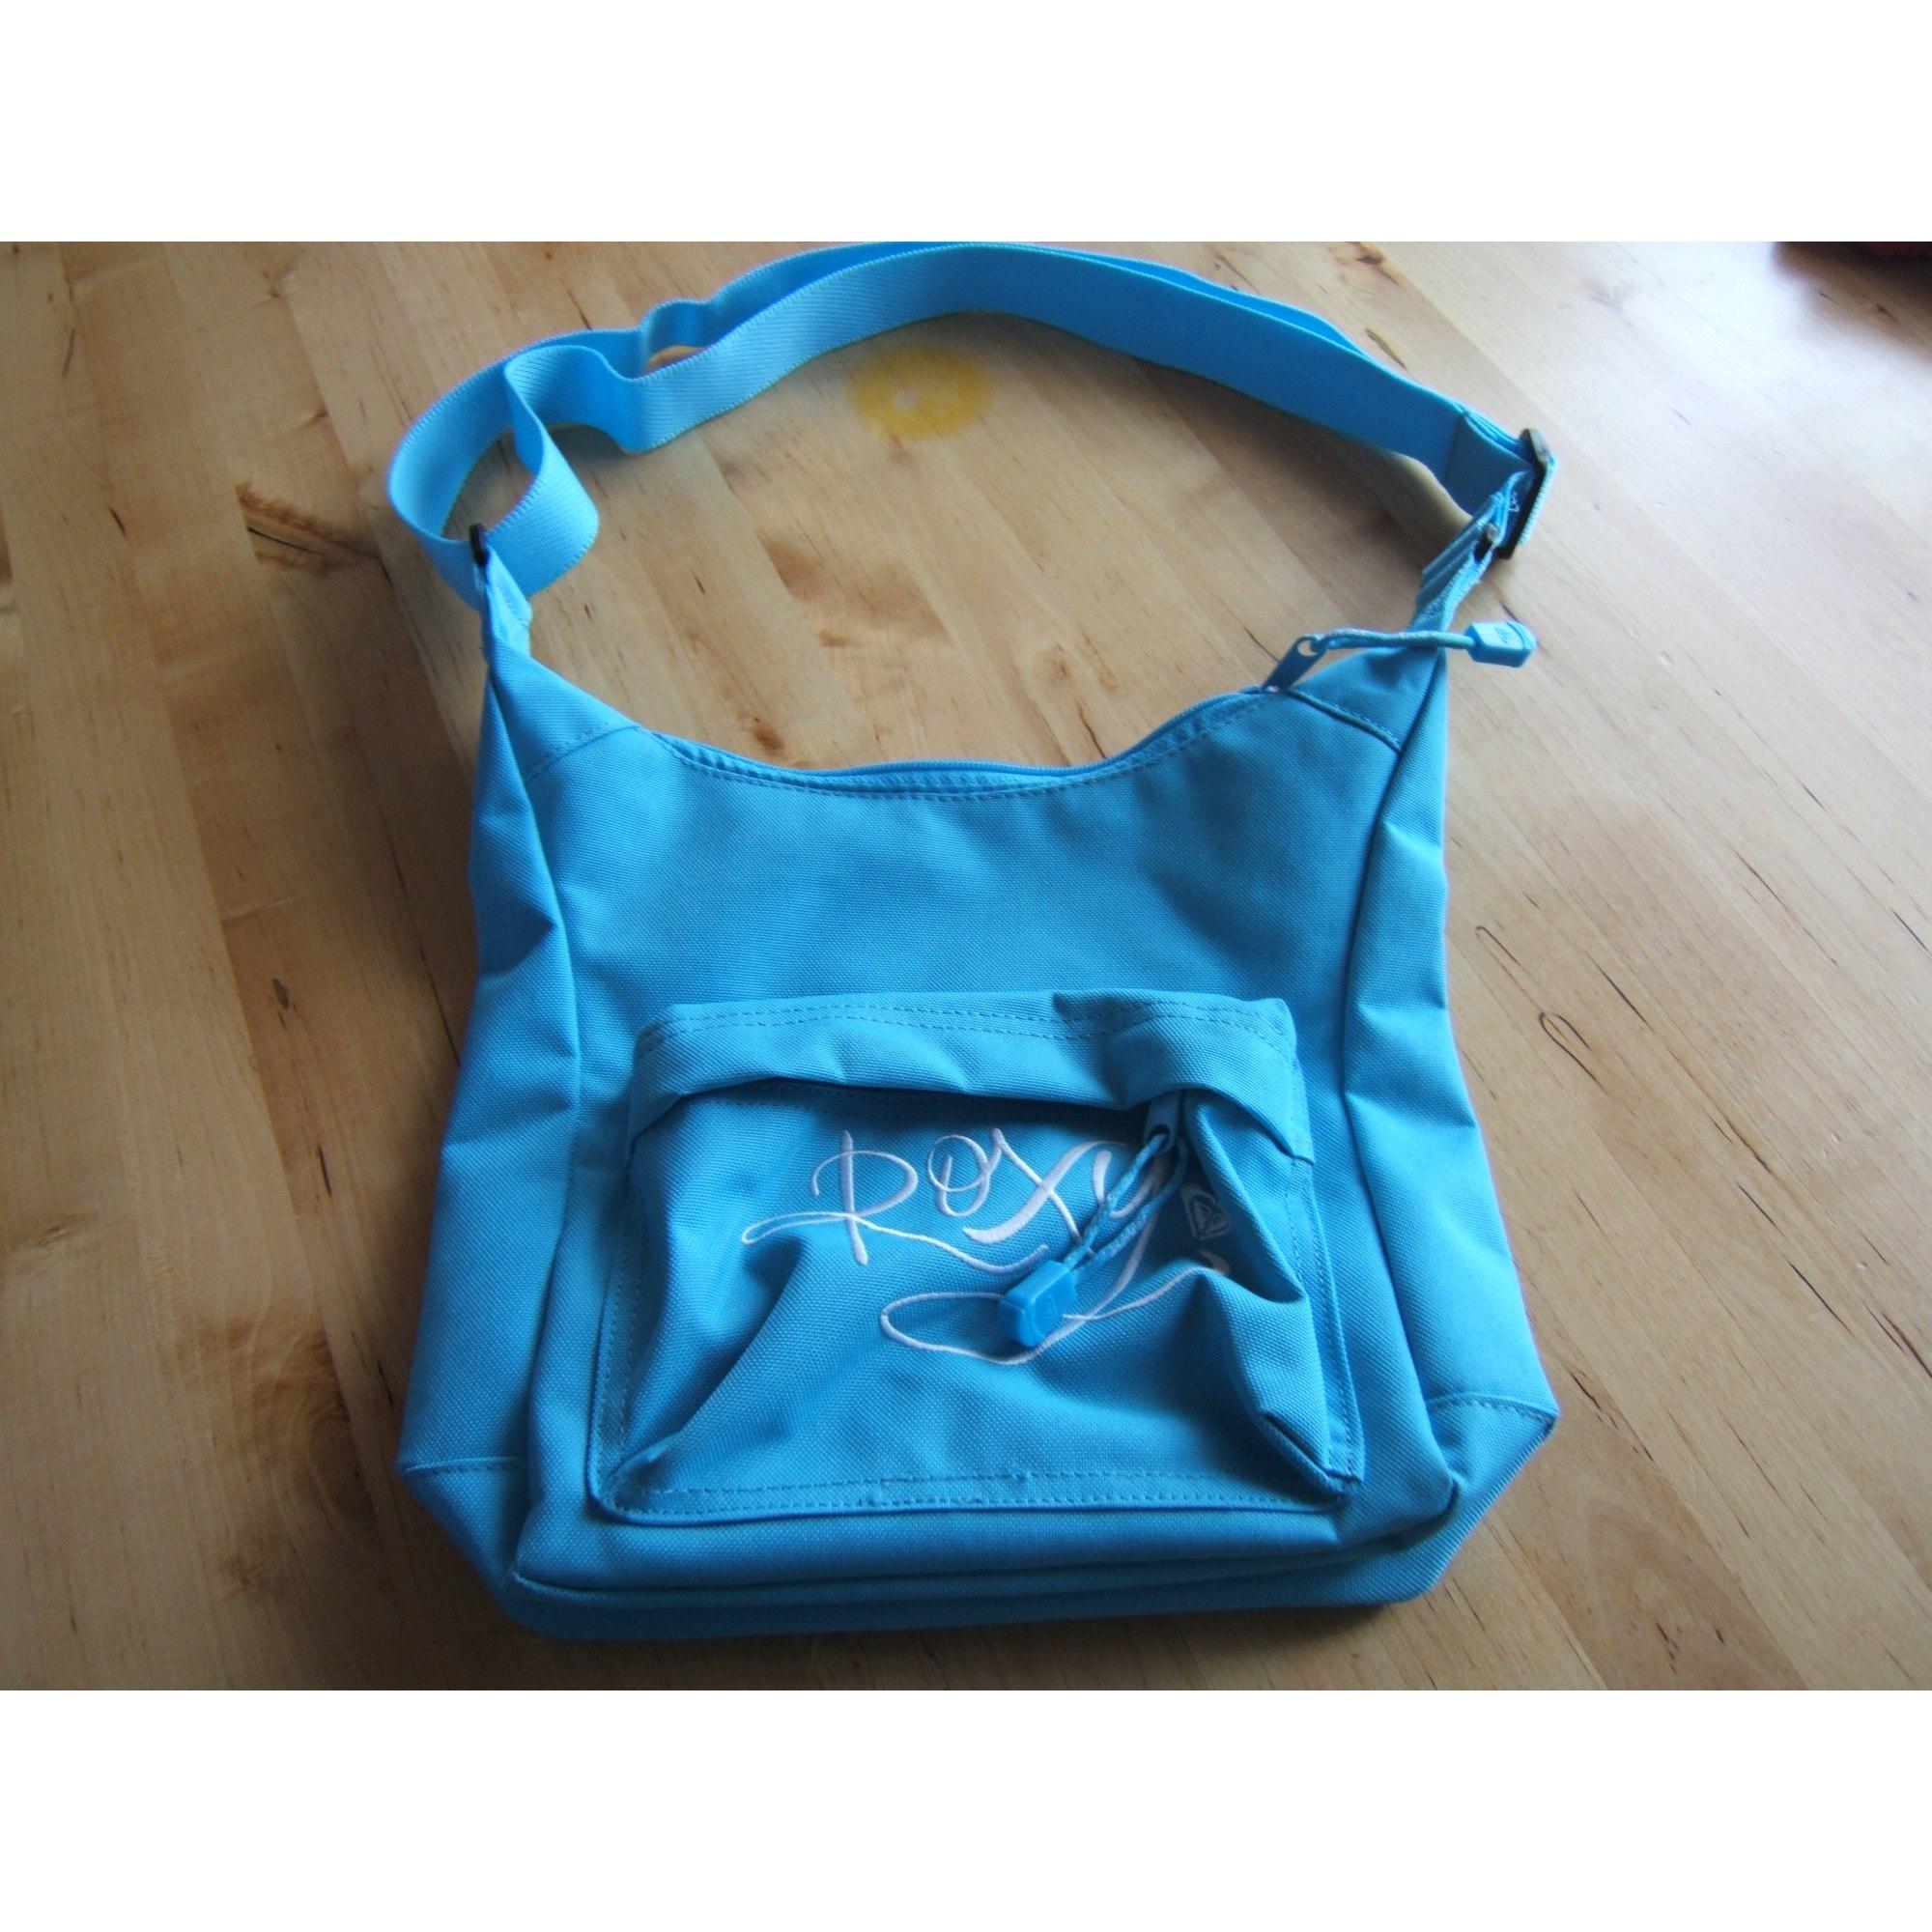 Tissu 2204551 En Roxy Bleu Bandoulière Sac v0nNwm8O